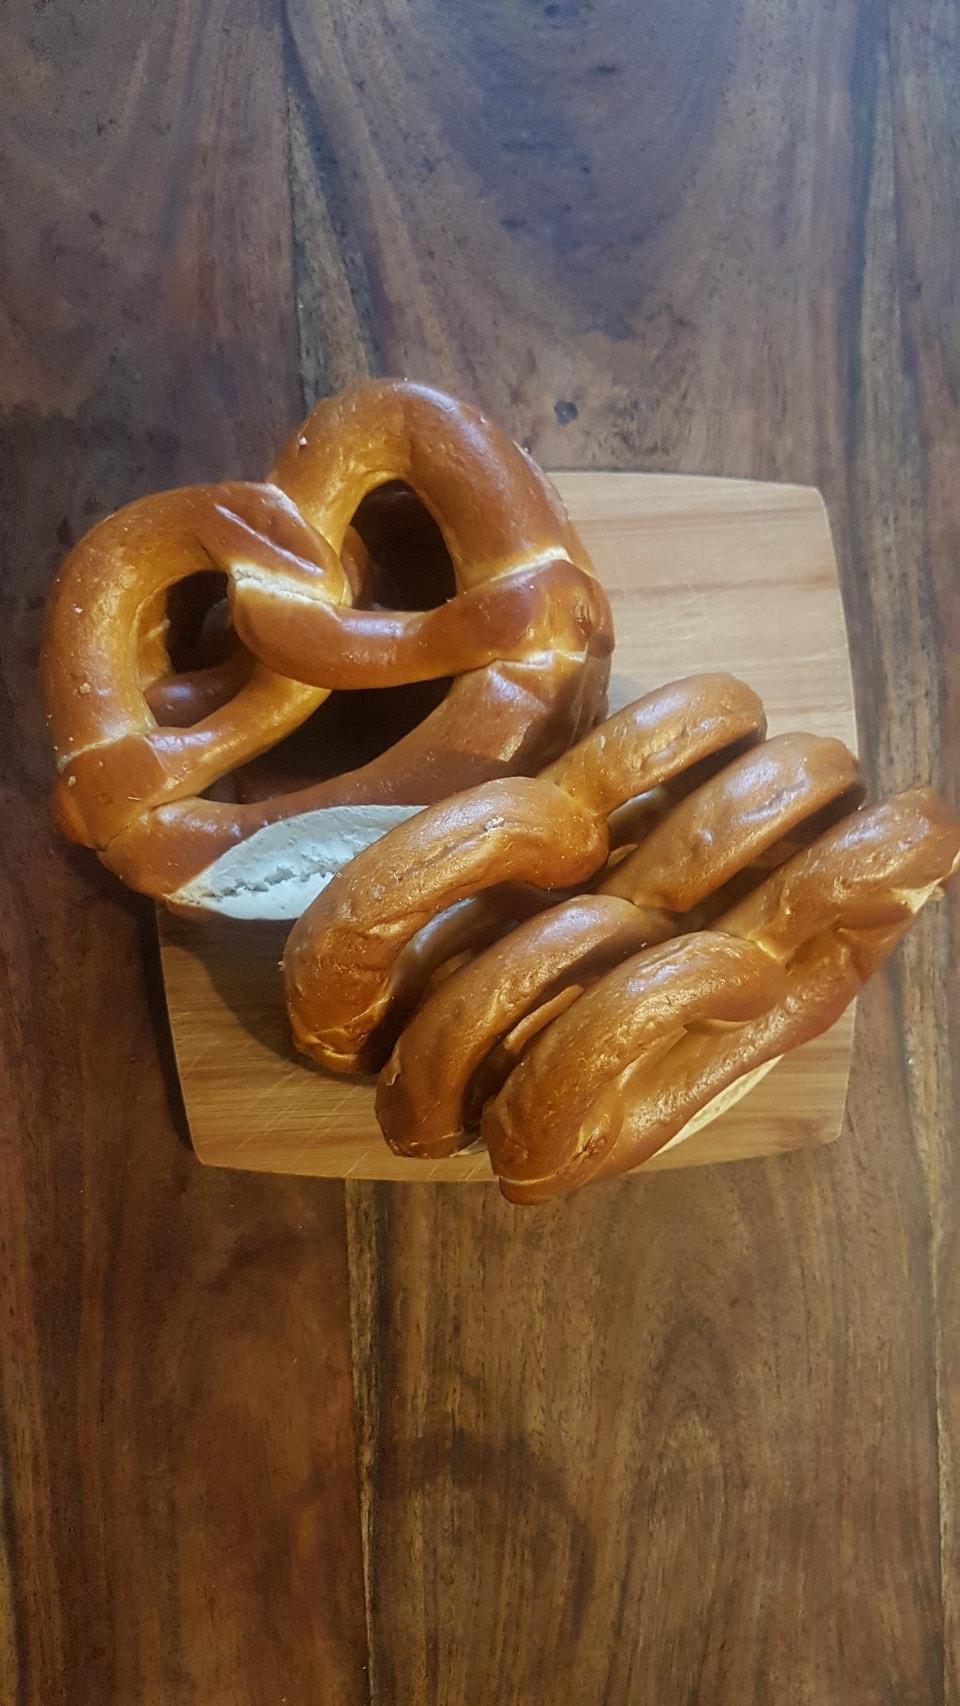 Tesco large pretzels